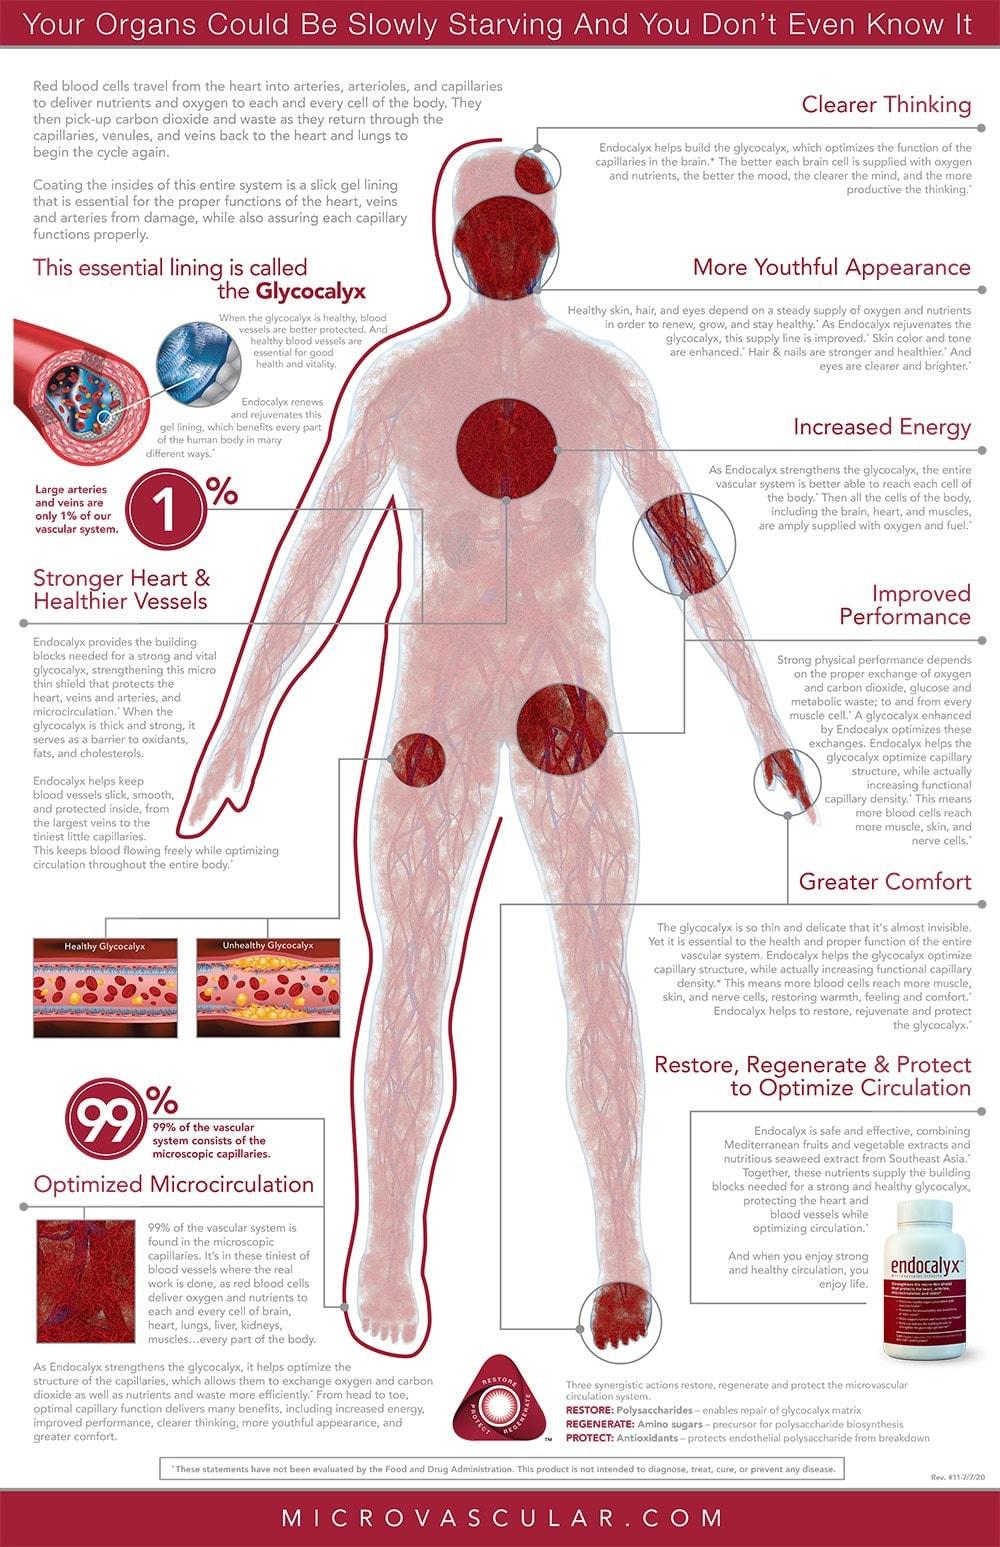 Microvascular-man-22x34poster-jul20-1-MV-Red-Label